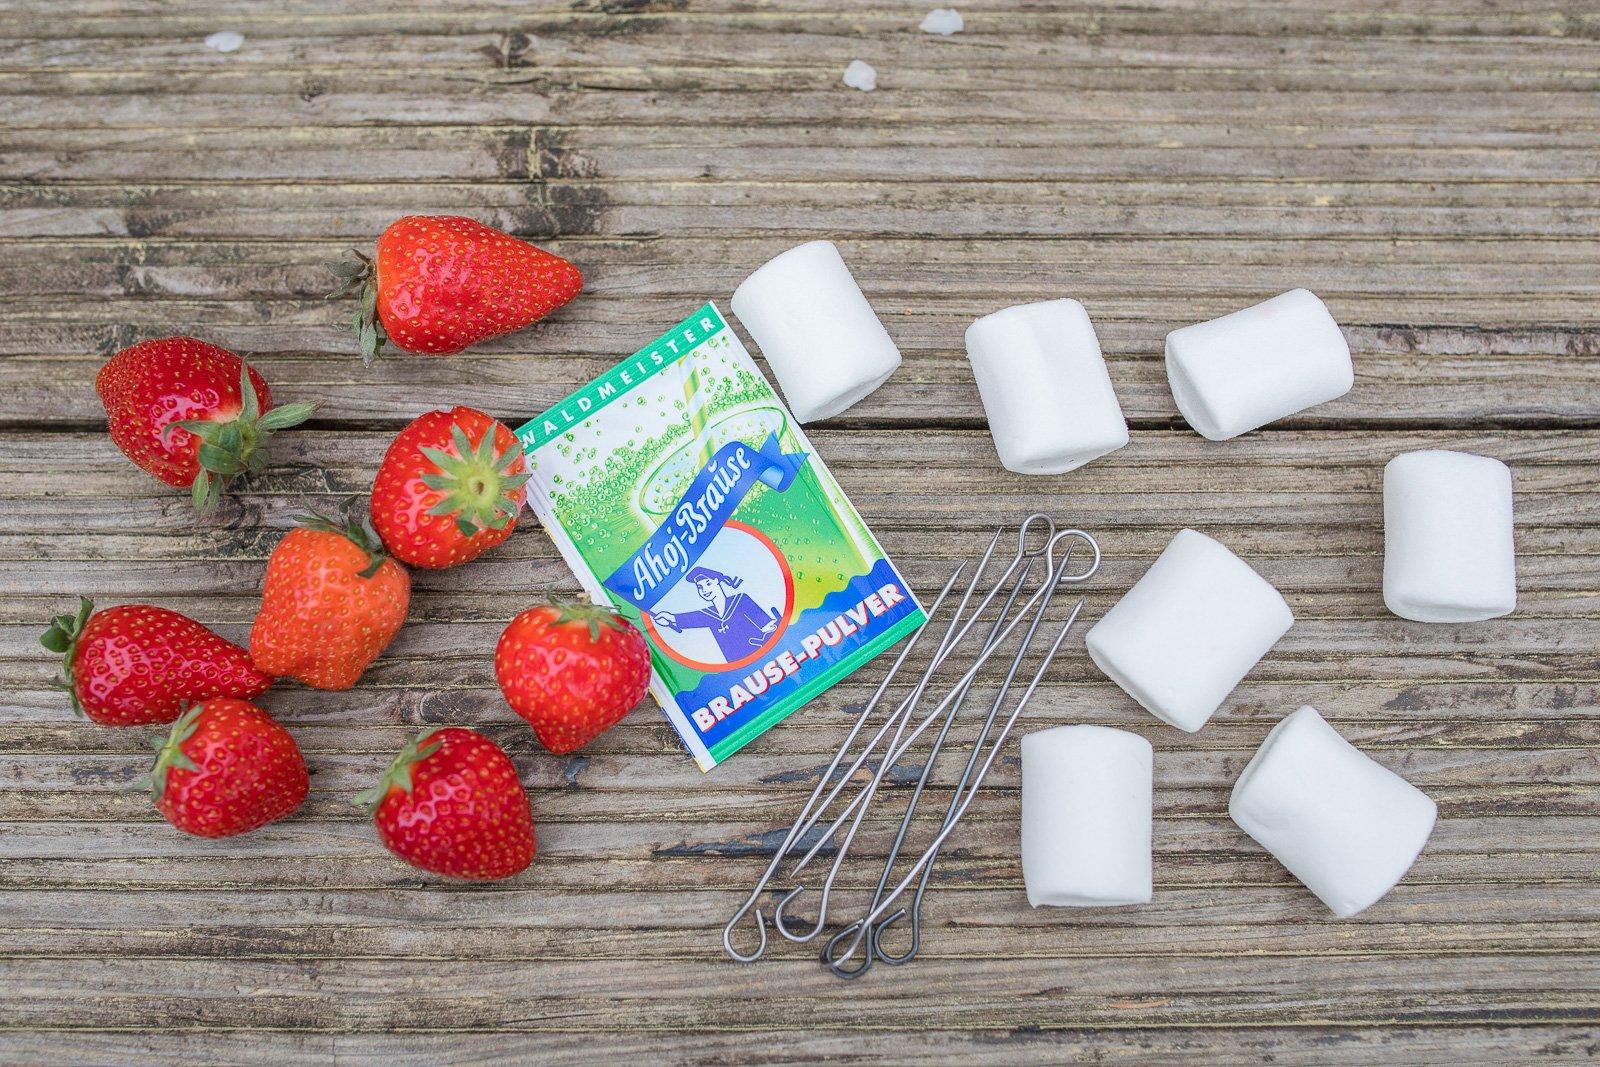 zutaten gegrillte marshmallow Erdbeeren